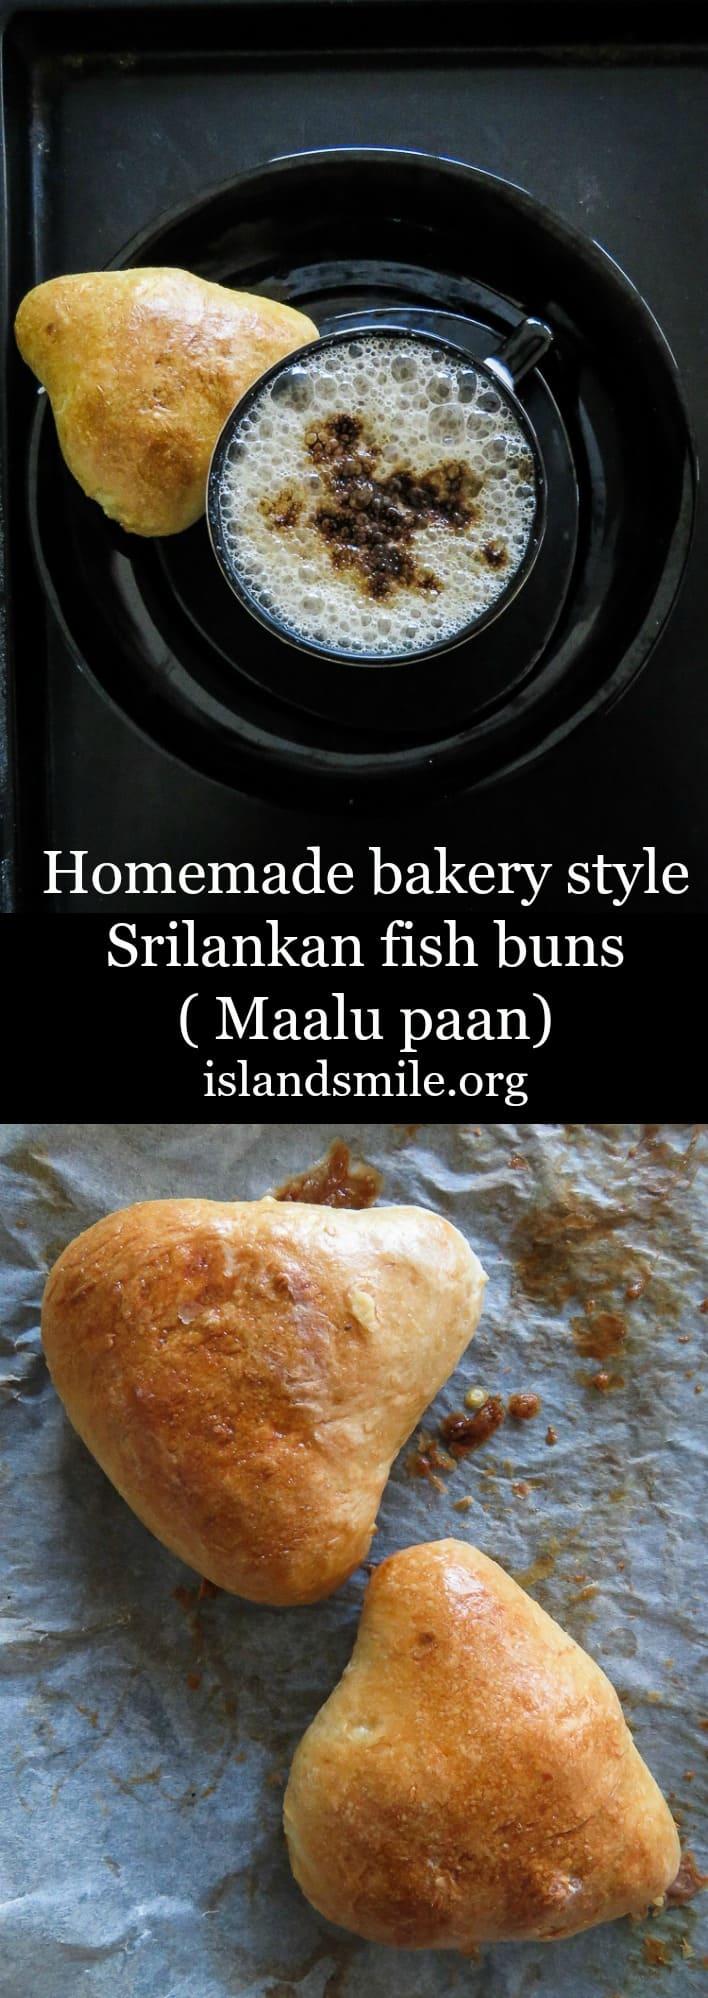 Homemade bakery style Srilankan fish buns(Maalu paan).